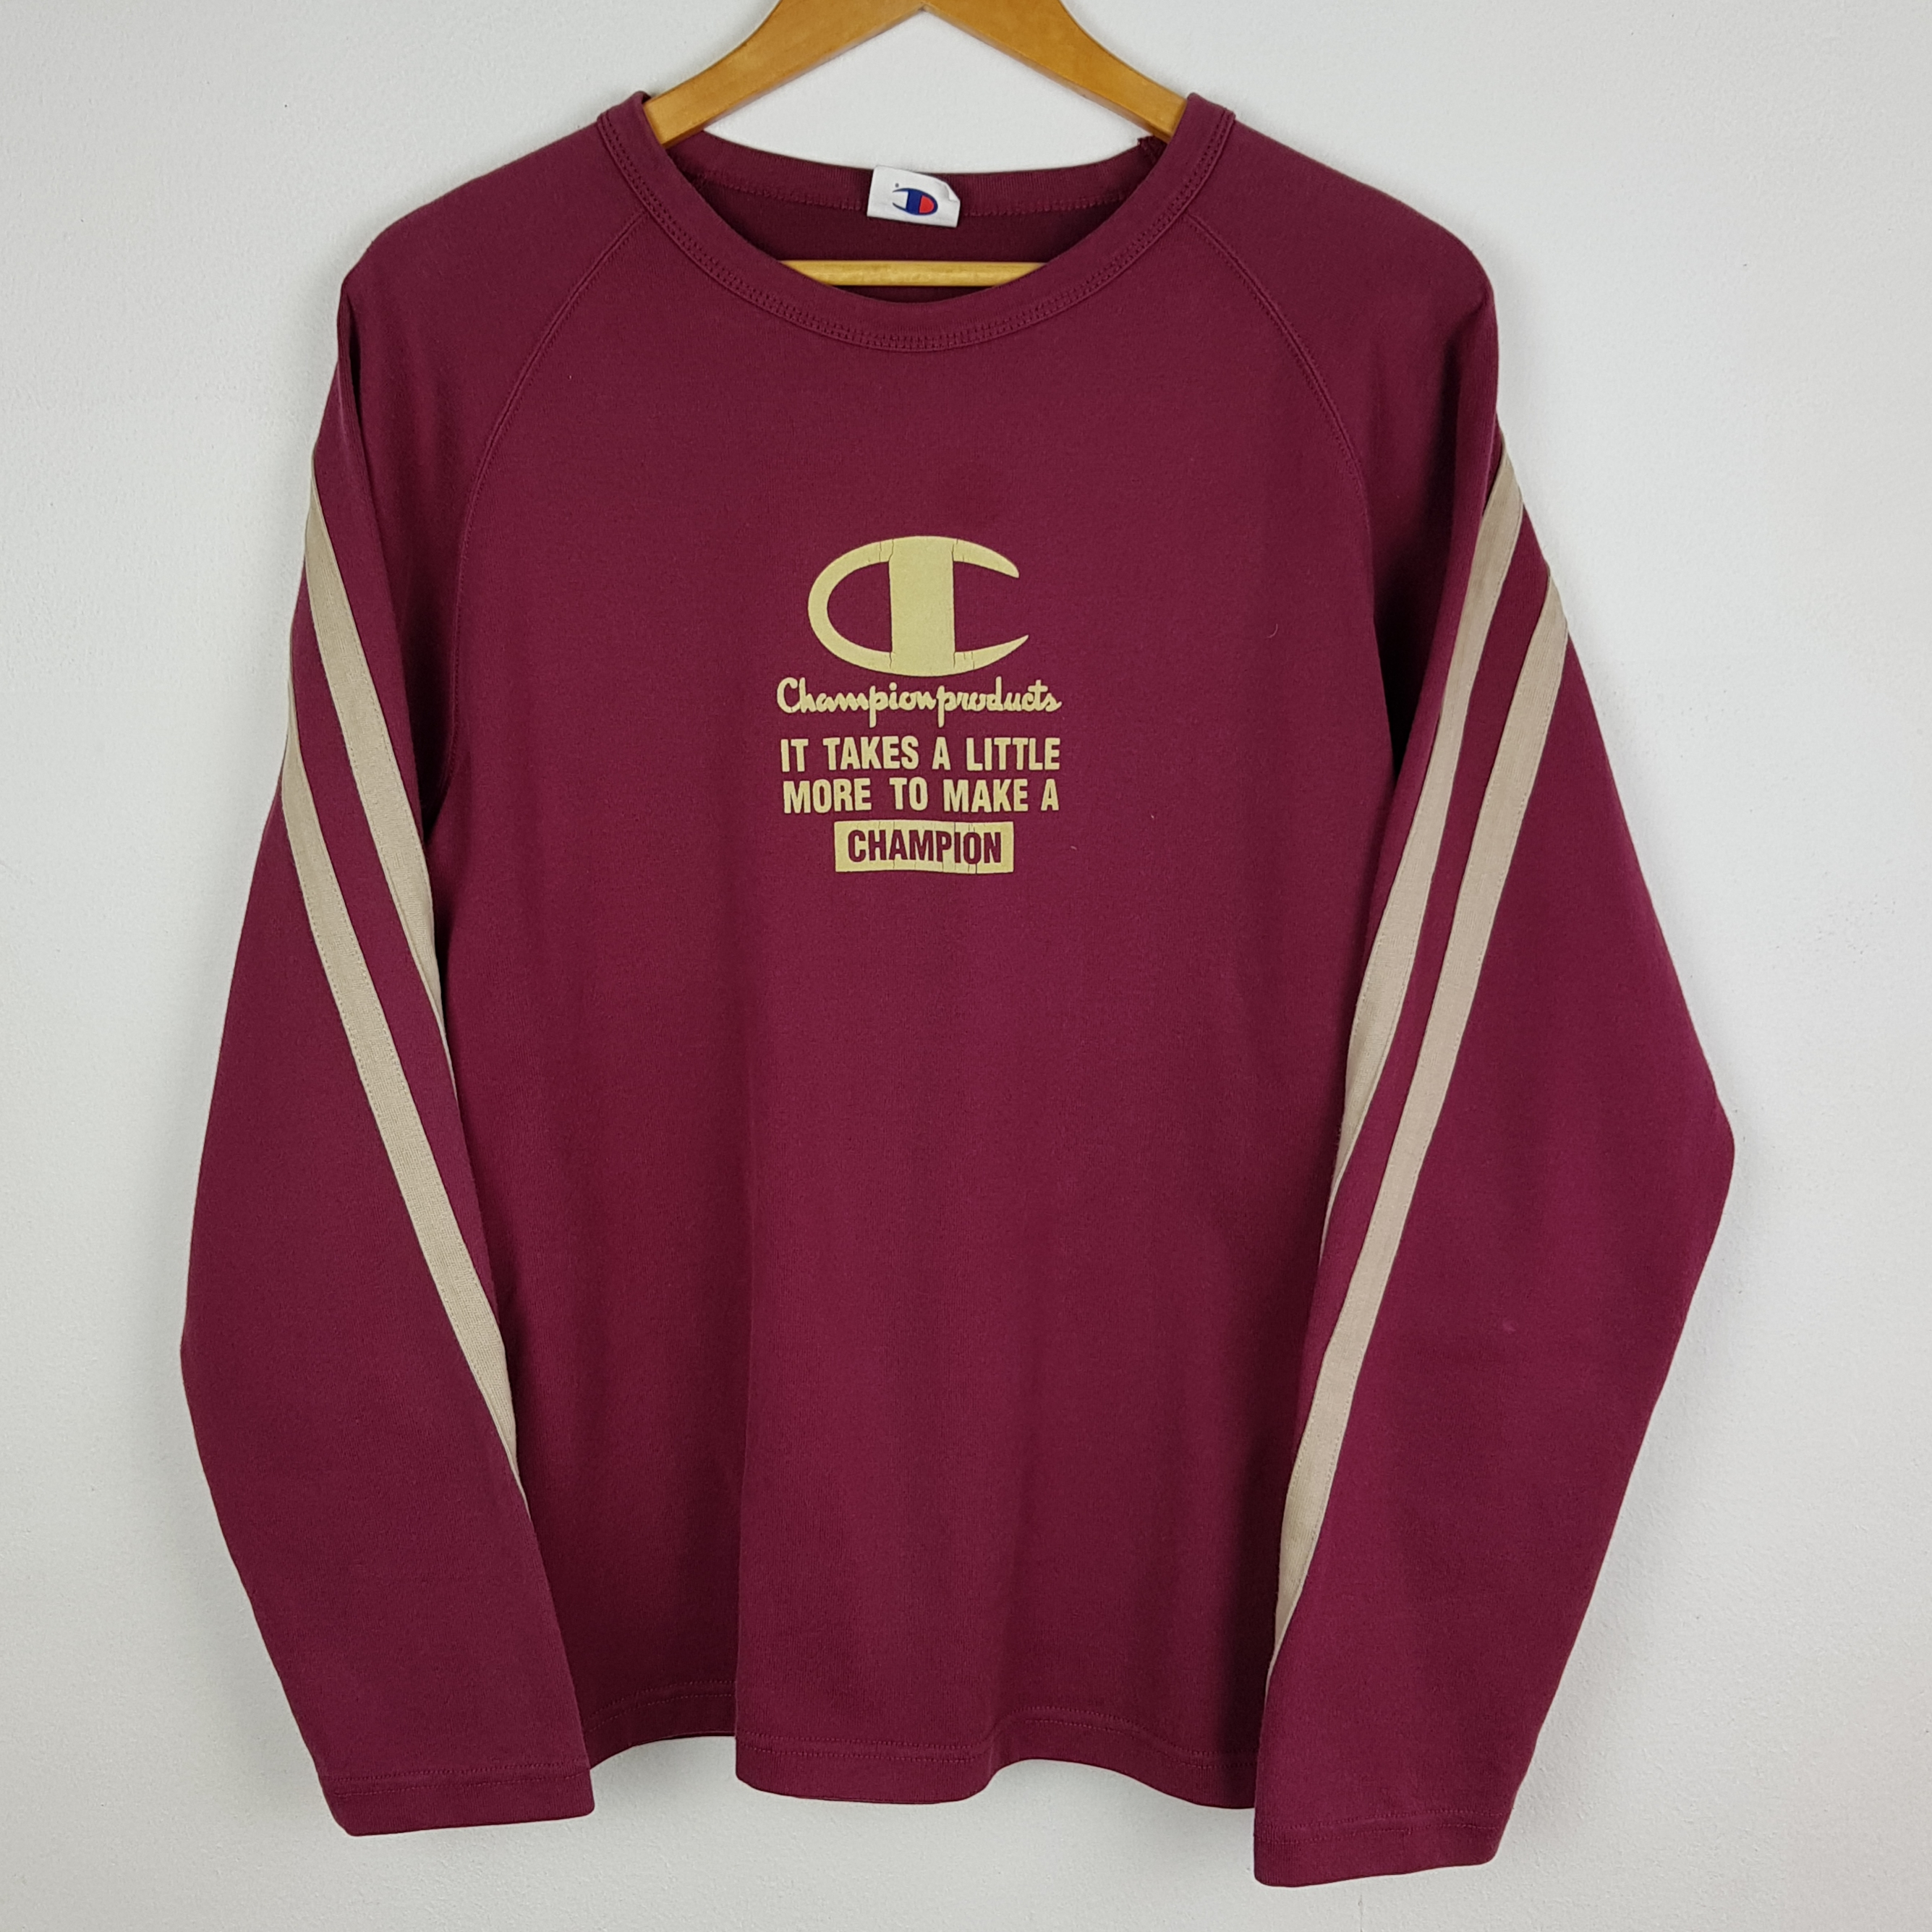 735c1c8aa Champion Vintage 90s Champion Athletic Wear Sweatshirt   adult    L ...